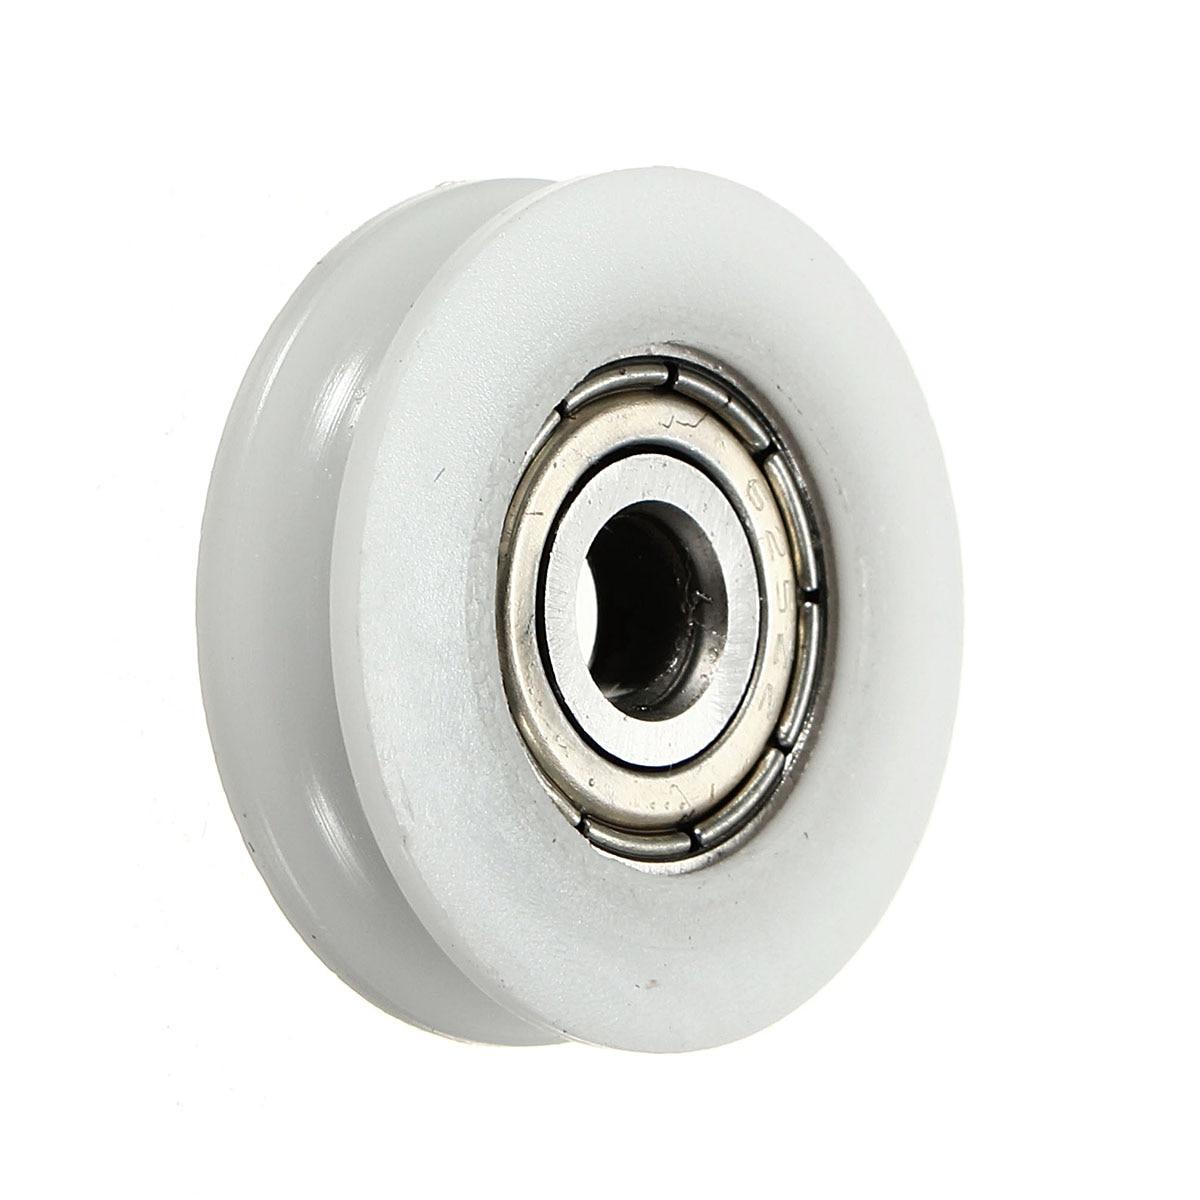 New 6*30*10mm U Groove Metal Shield Nylon Pulley Wheels Roller Ball Bearings HI